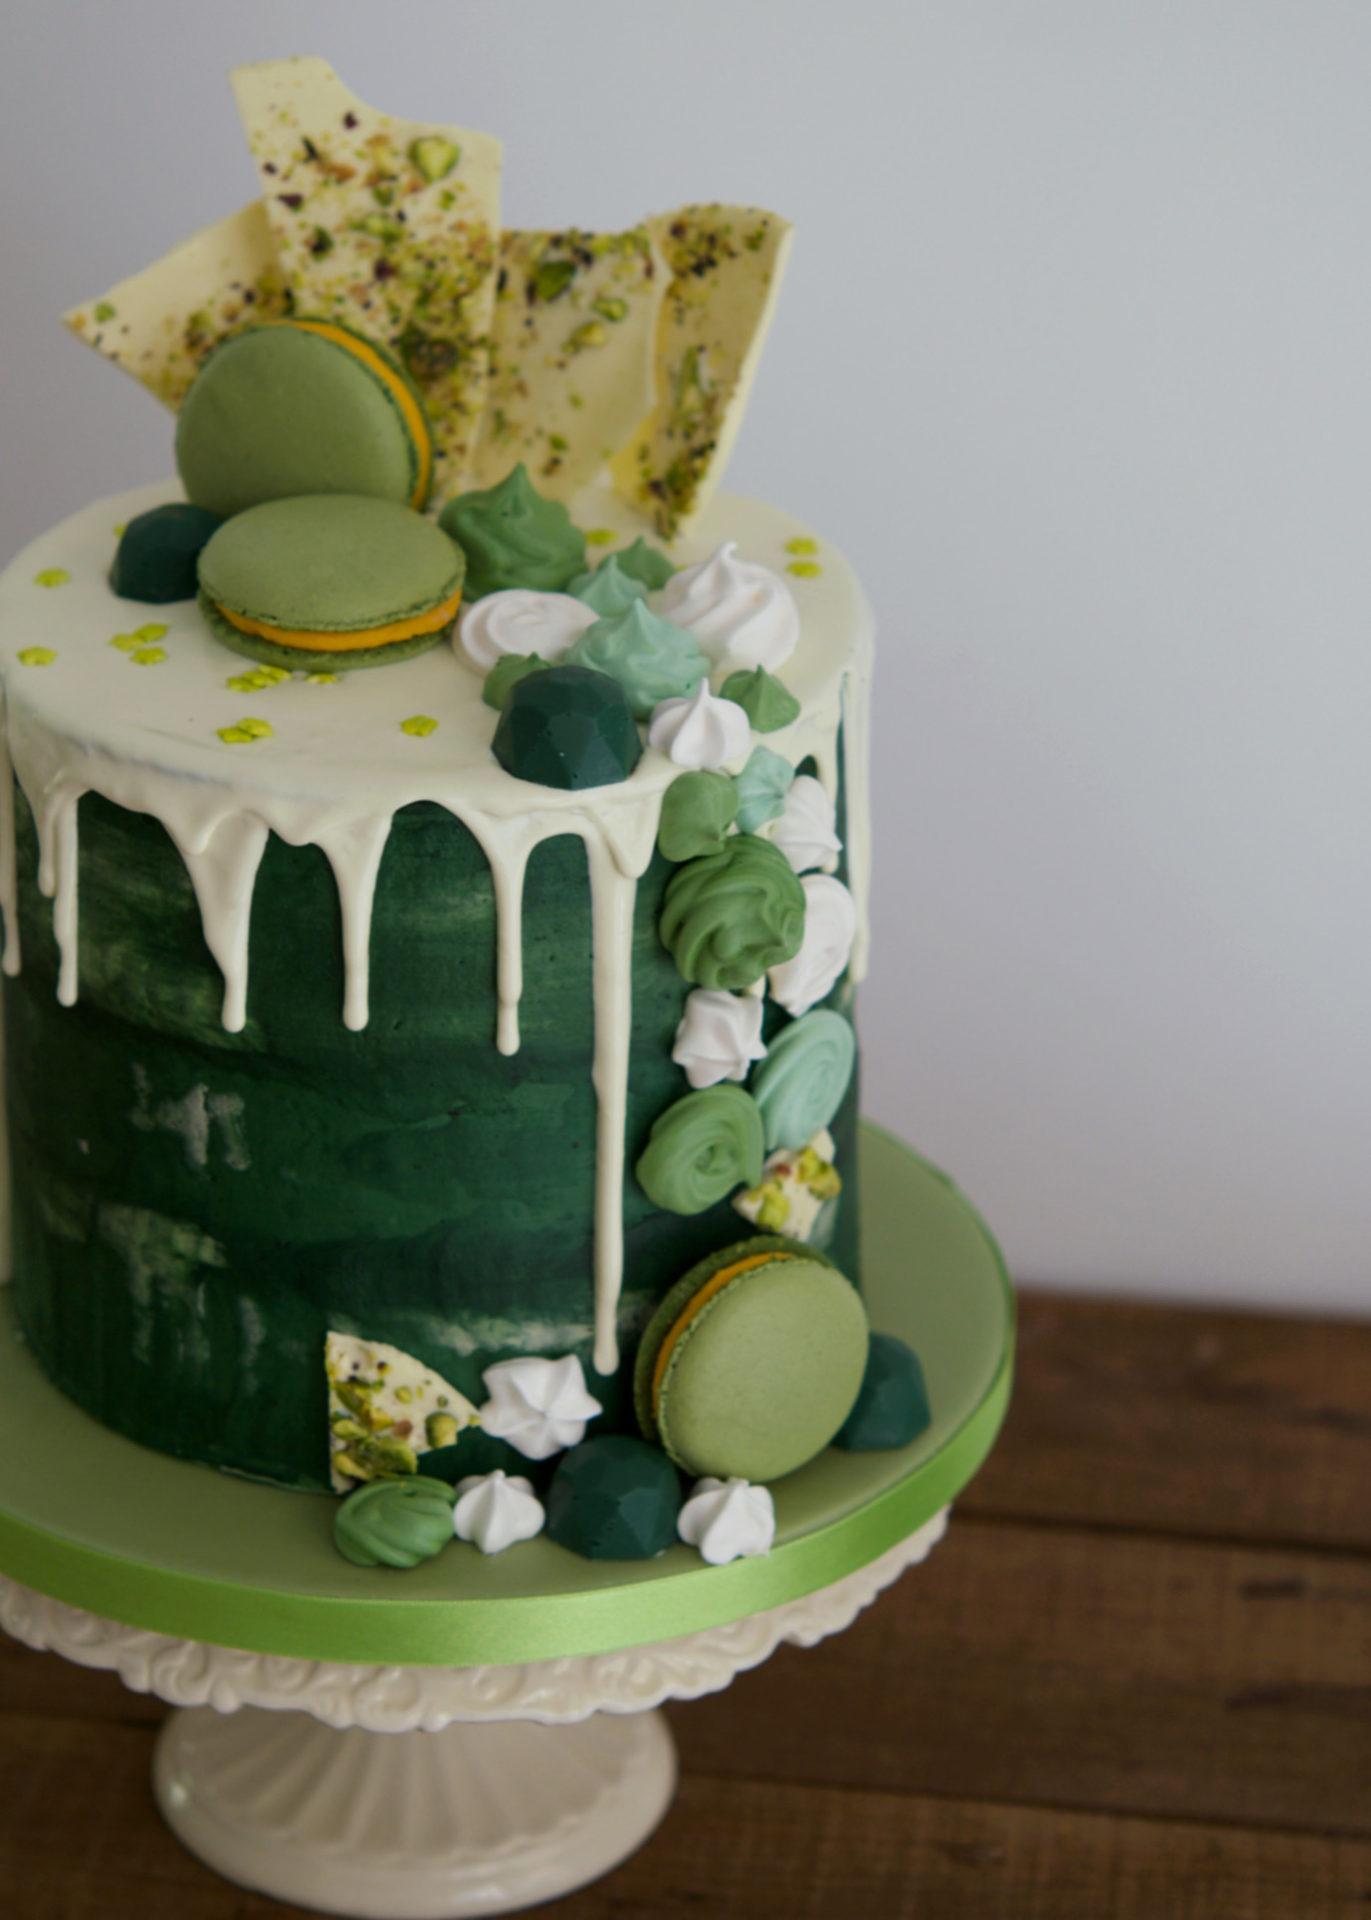 Curso Drip Cakes, Mericakes, curso reposteria, barcelona, tartas decoradas, bombones, chocolate., 4